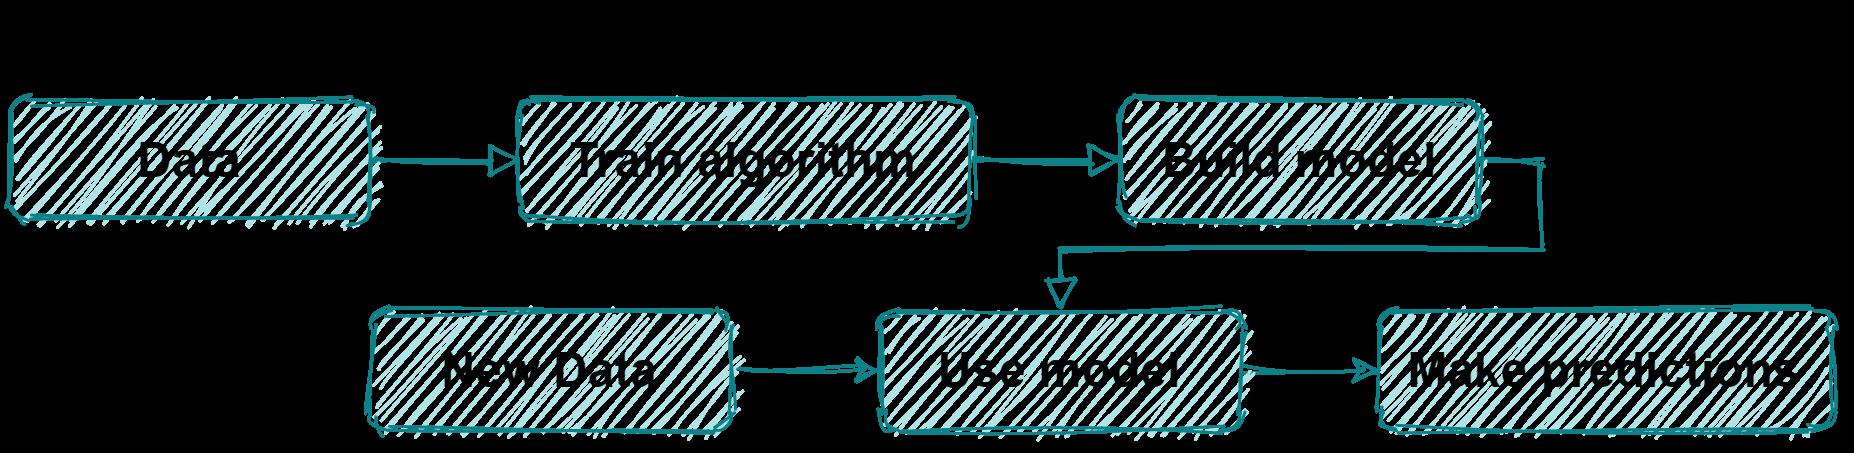 ML pipeline